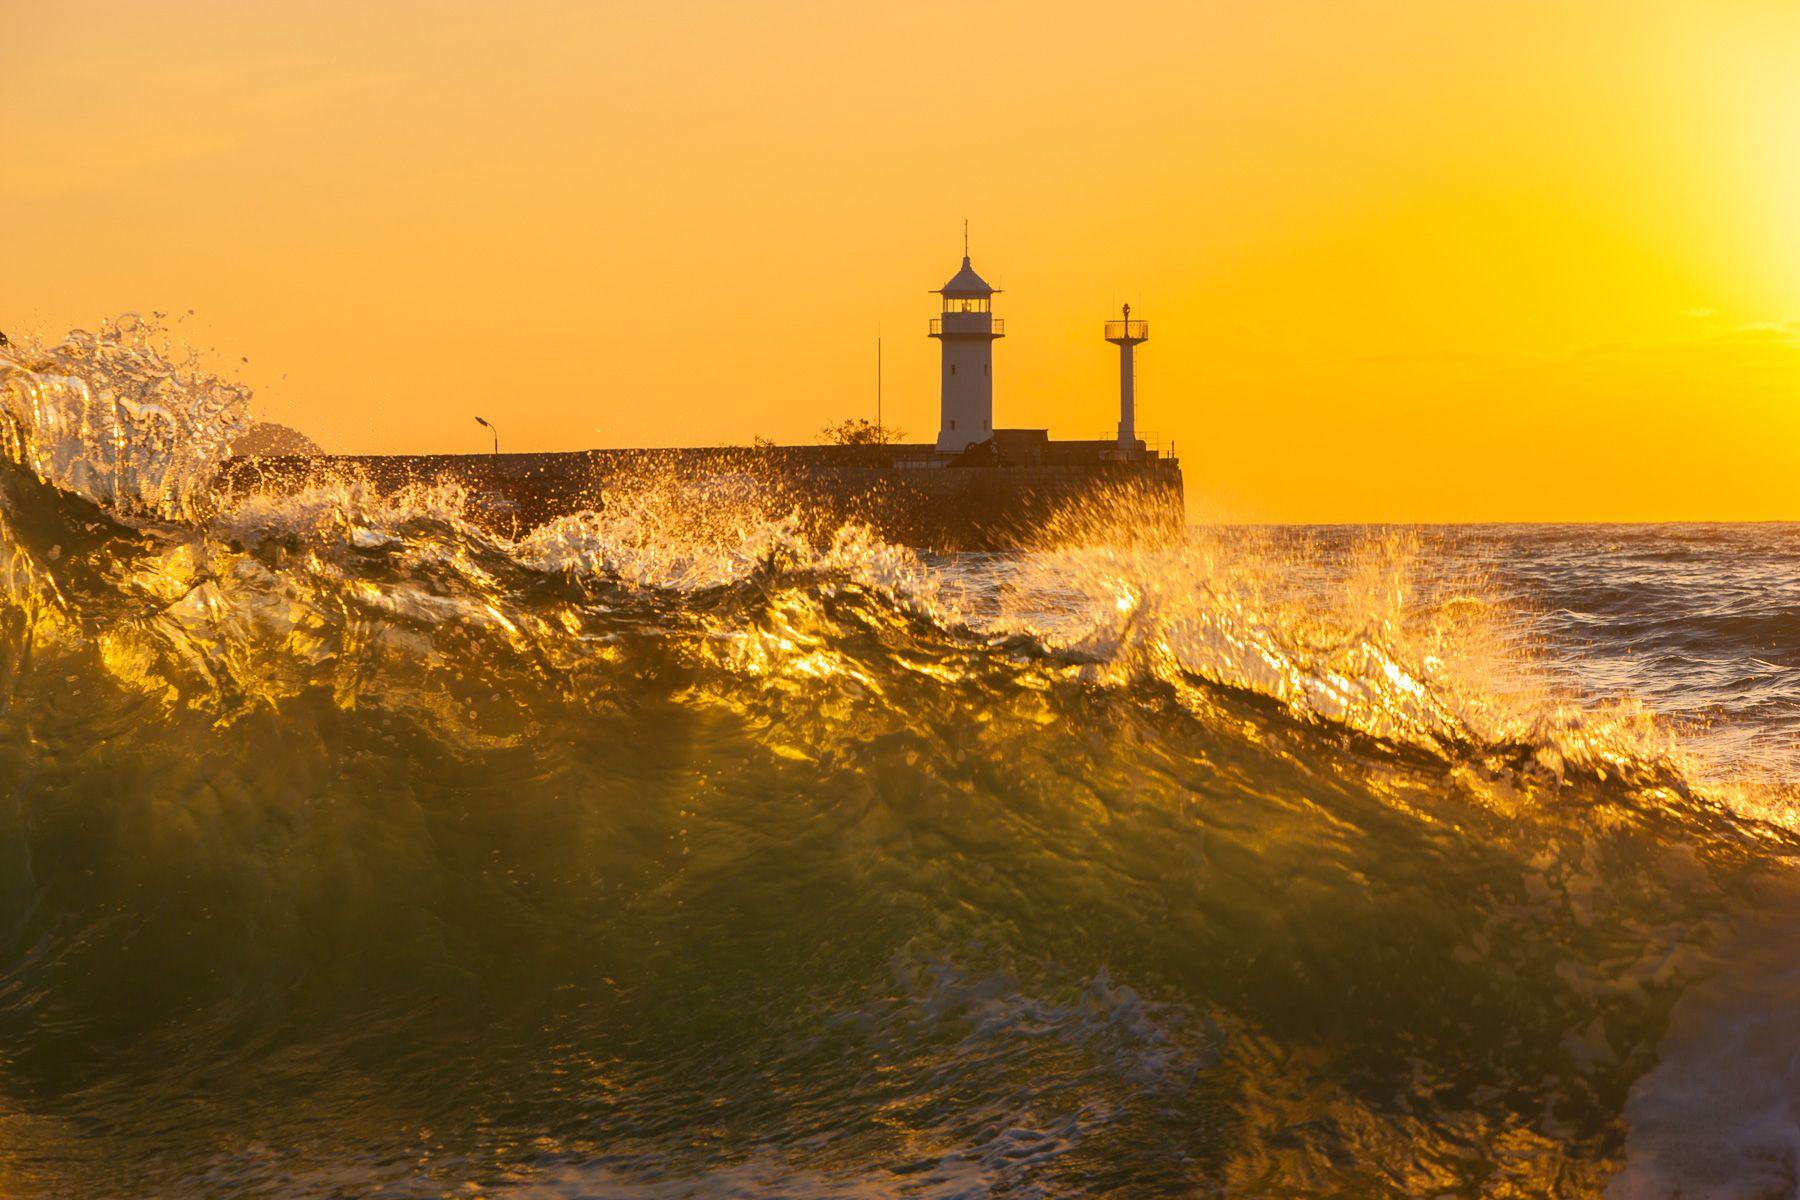 Шторм в Ялте Ялтинский маяк Ялта Крым Черное море залив фотограф шторм волна